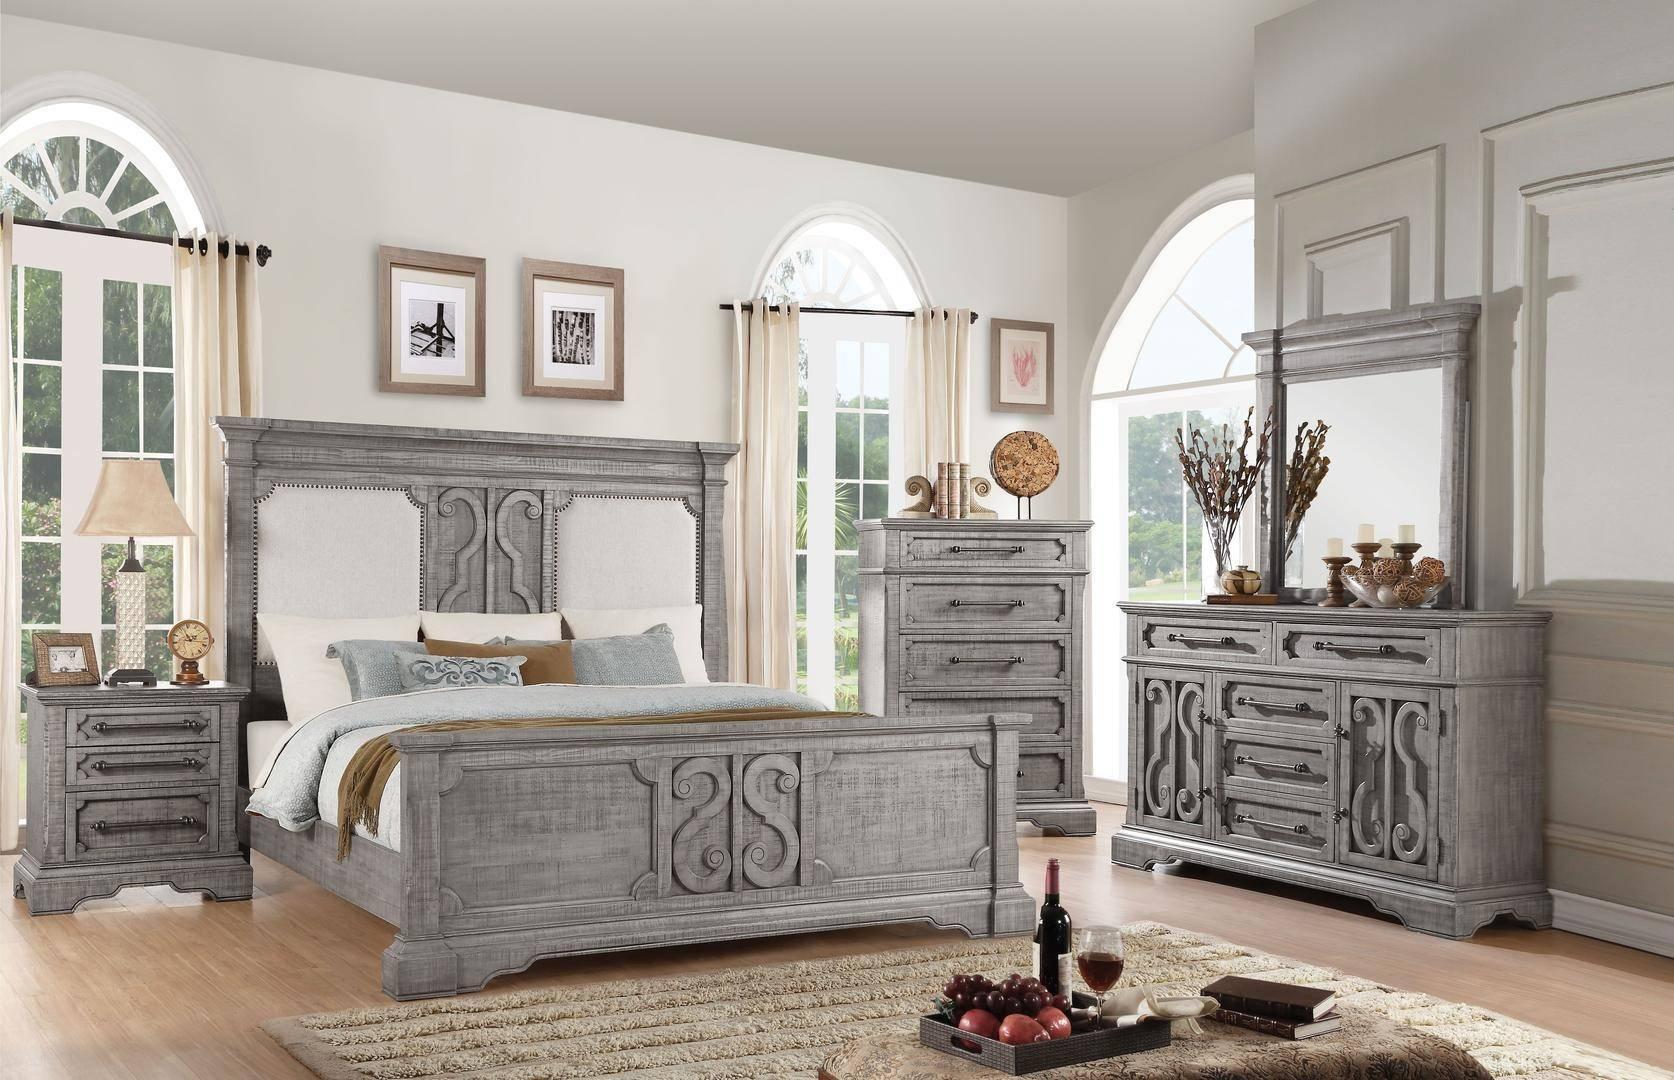 acme artesia queen panel bedroom set 3 pcs in natural wood fabric